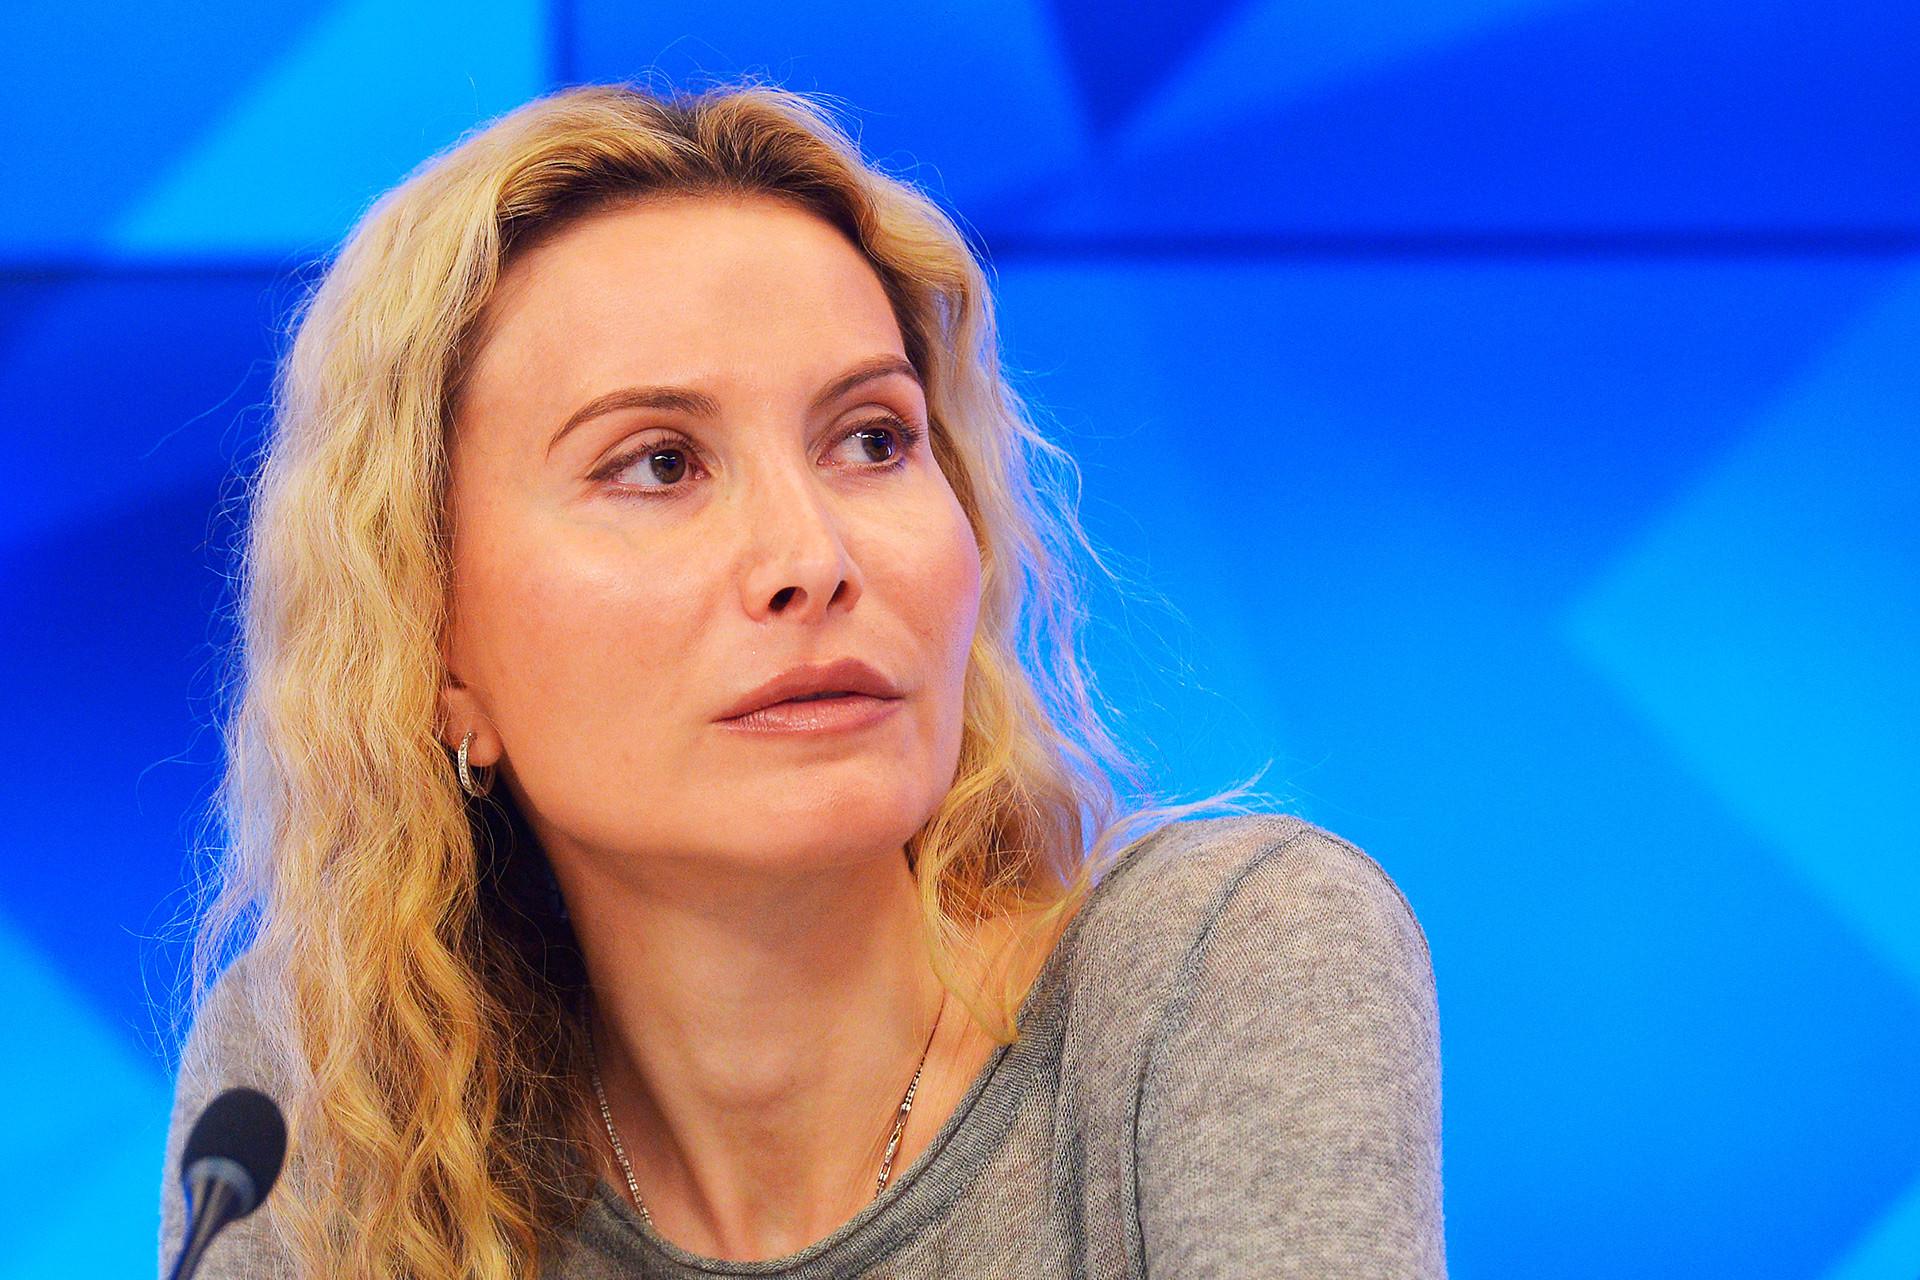 La entrenadora de Alexandra es Eteri Tutberidze.